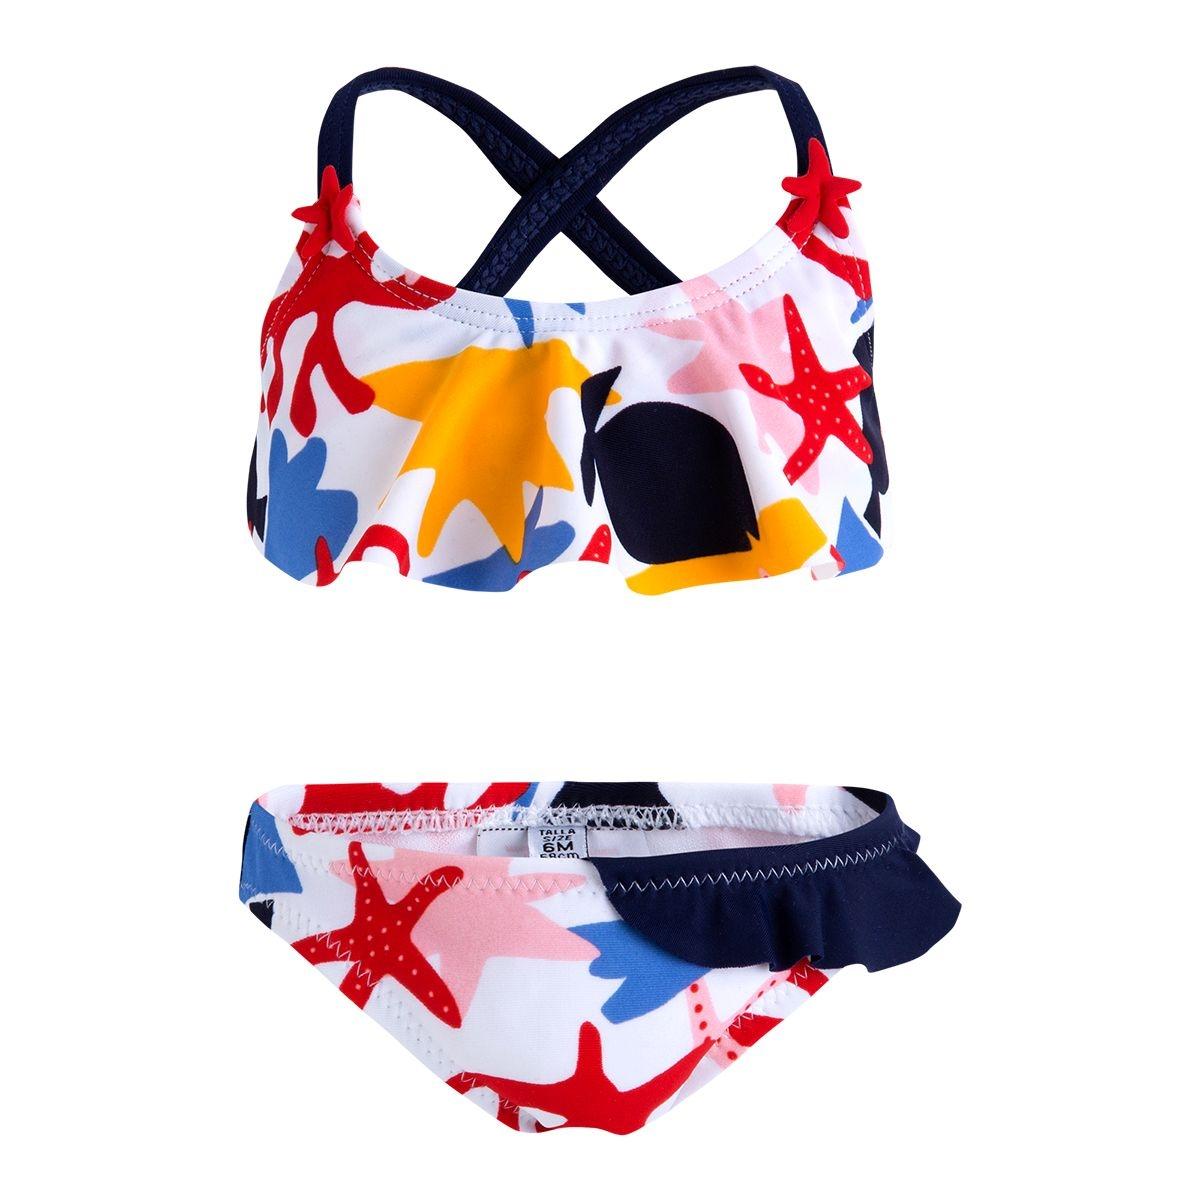 Maillot de bain bikini 2 pièces arrecife de motif dos